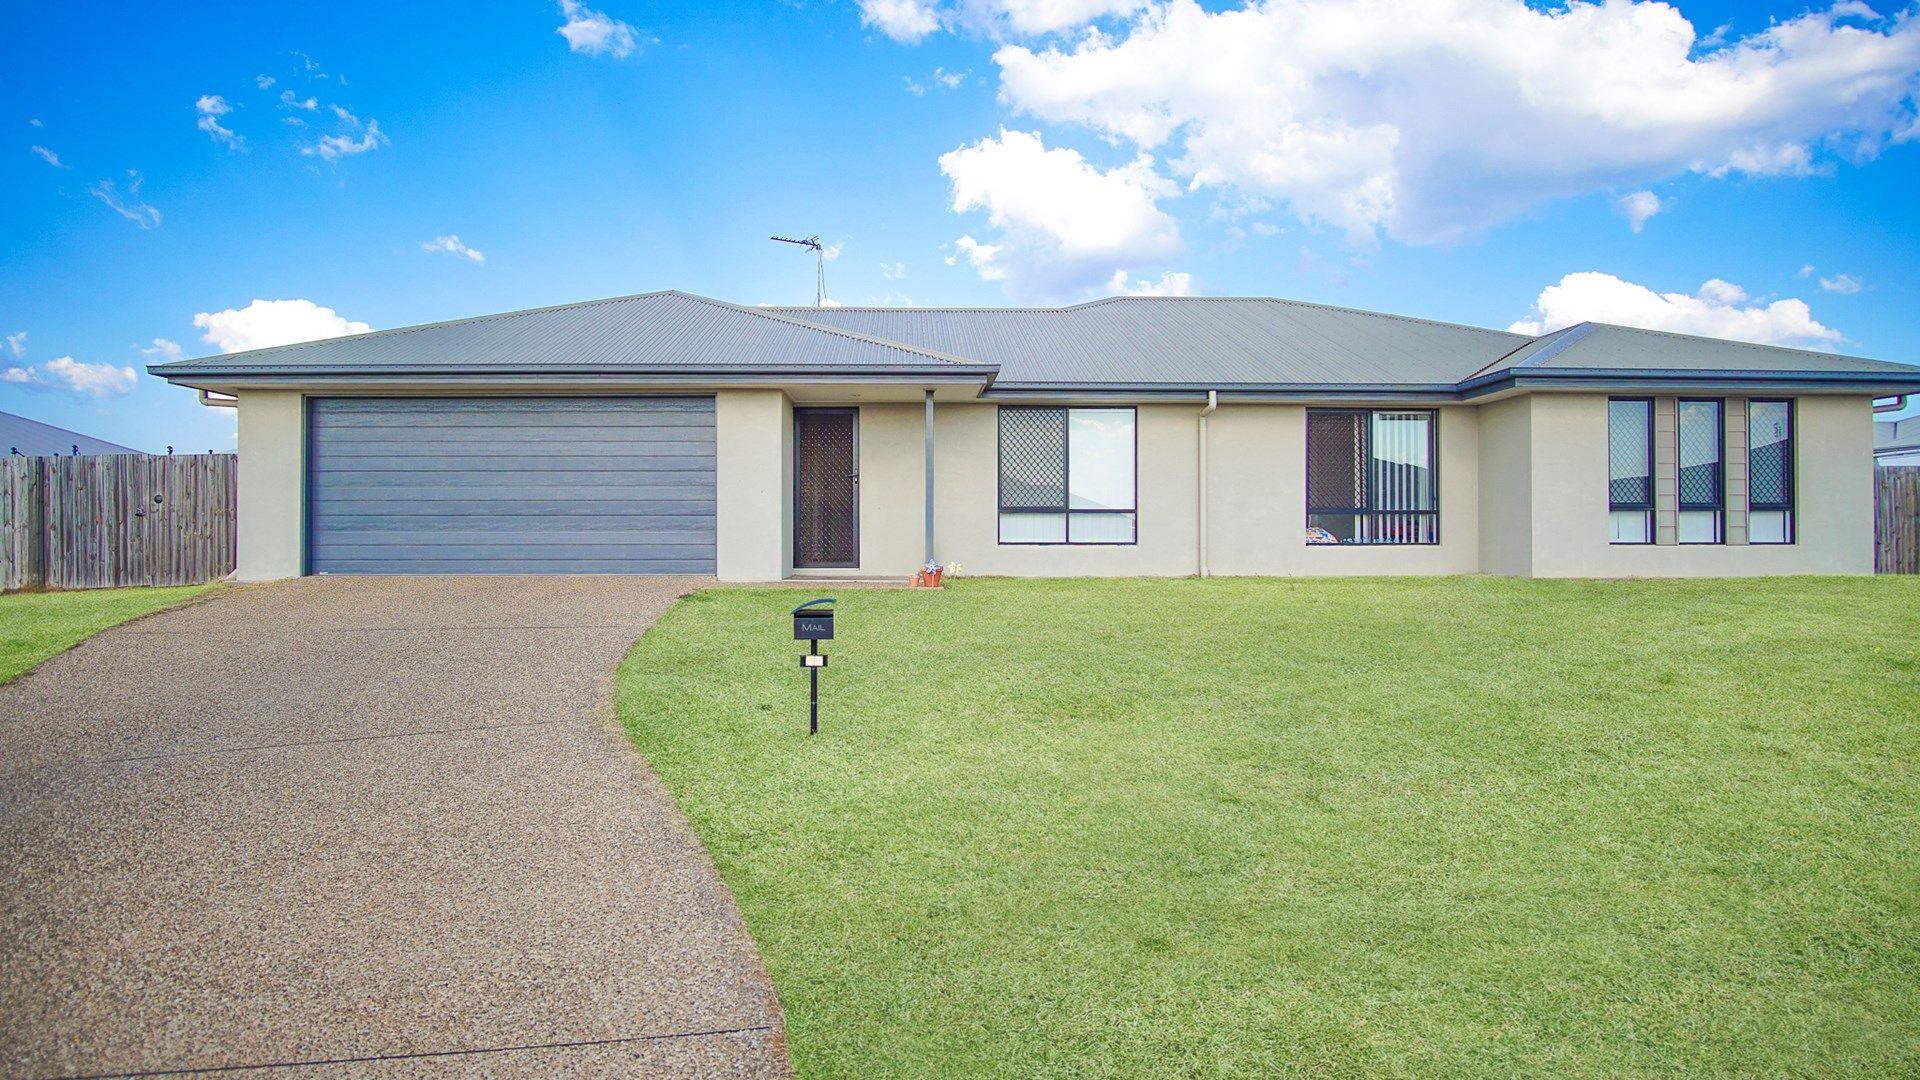 54 Trevean Drive, Kleinton QLD 4352, Image 0